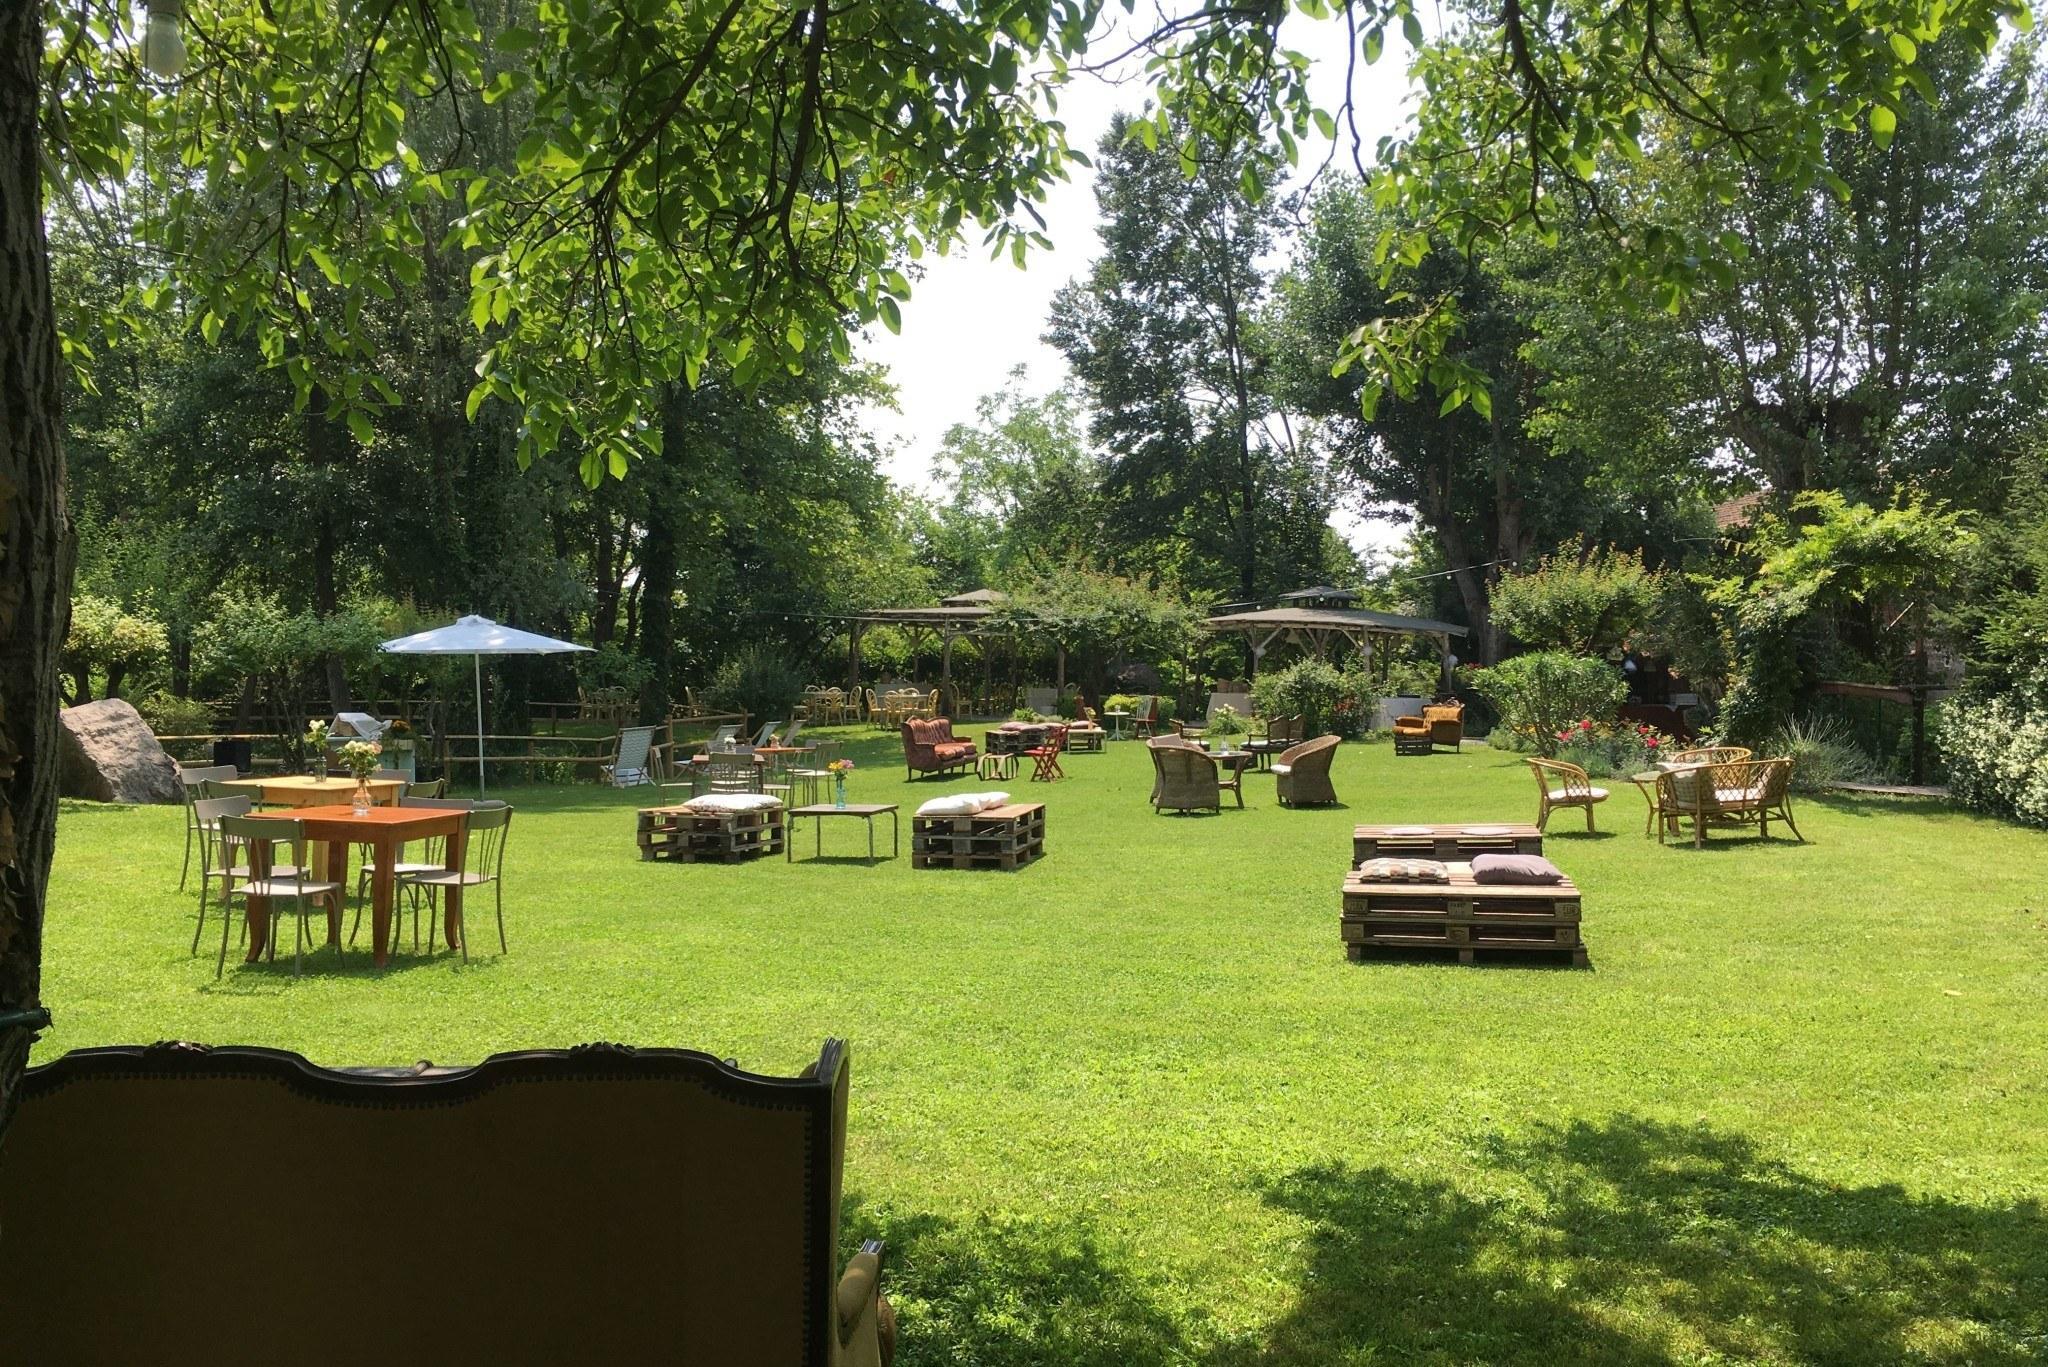 giardino_officinale57